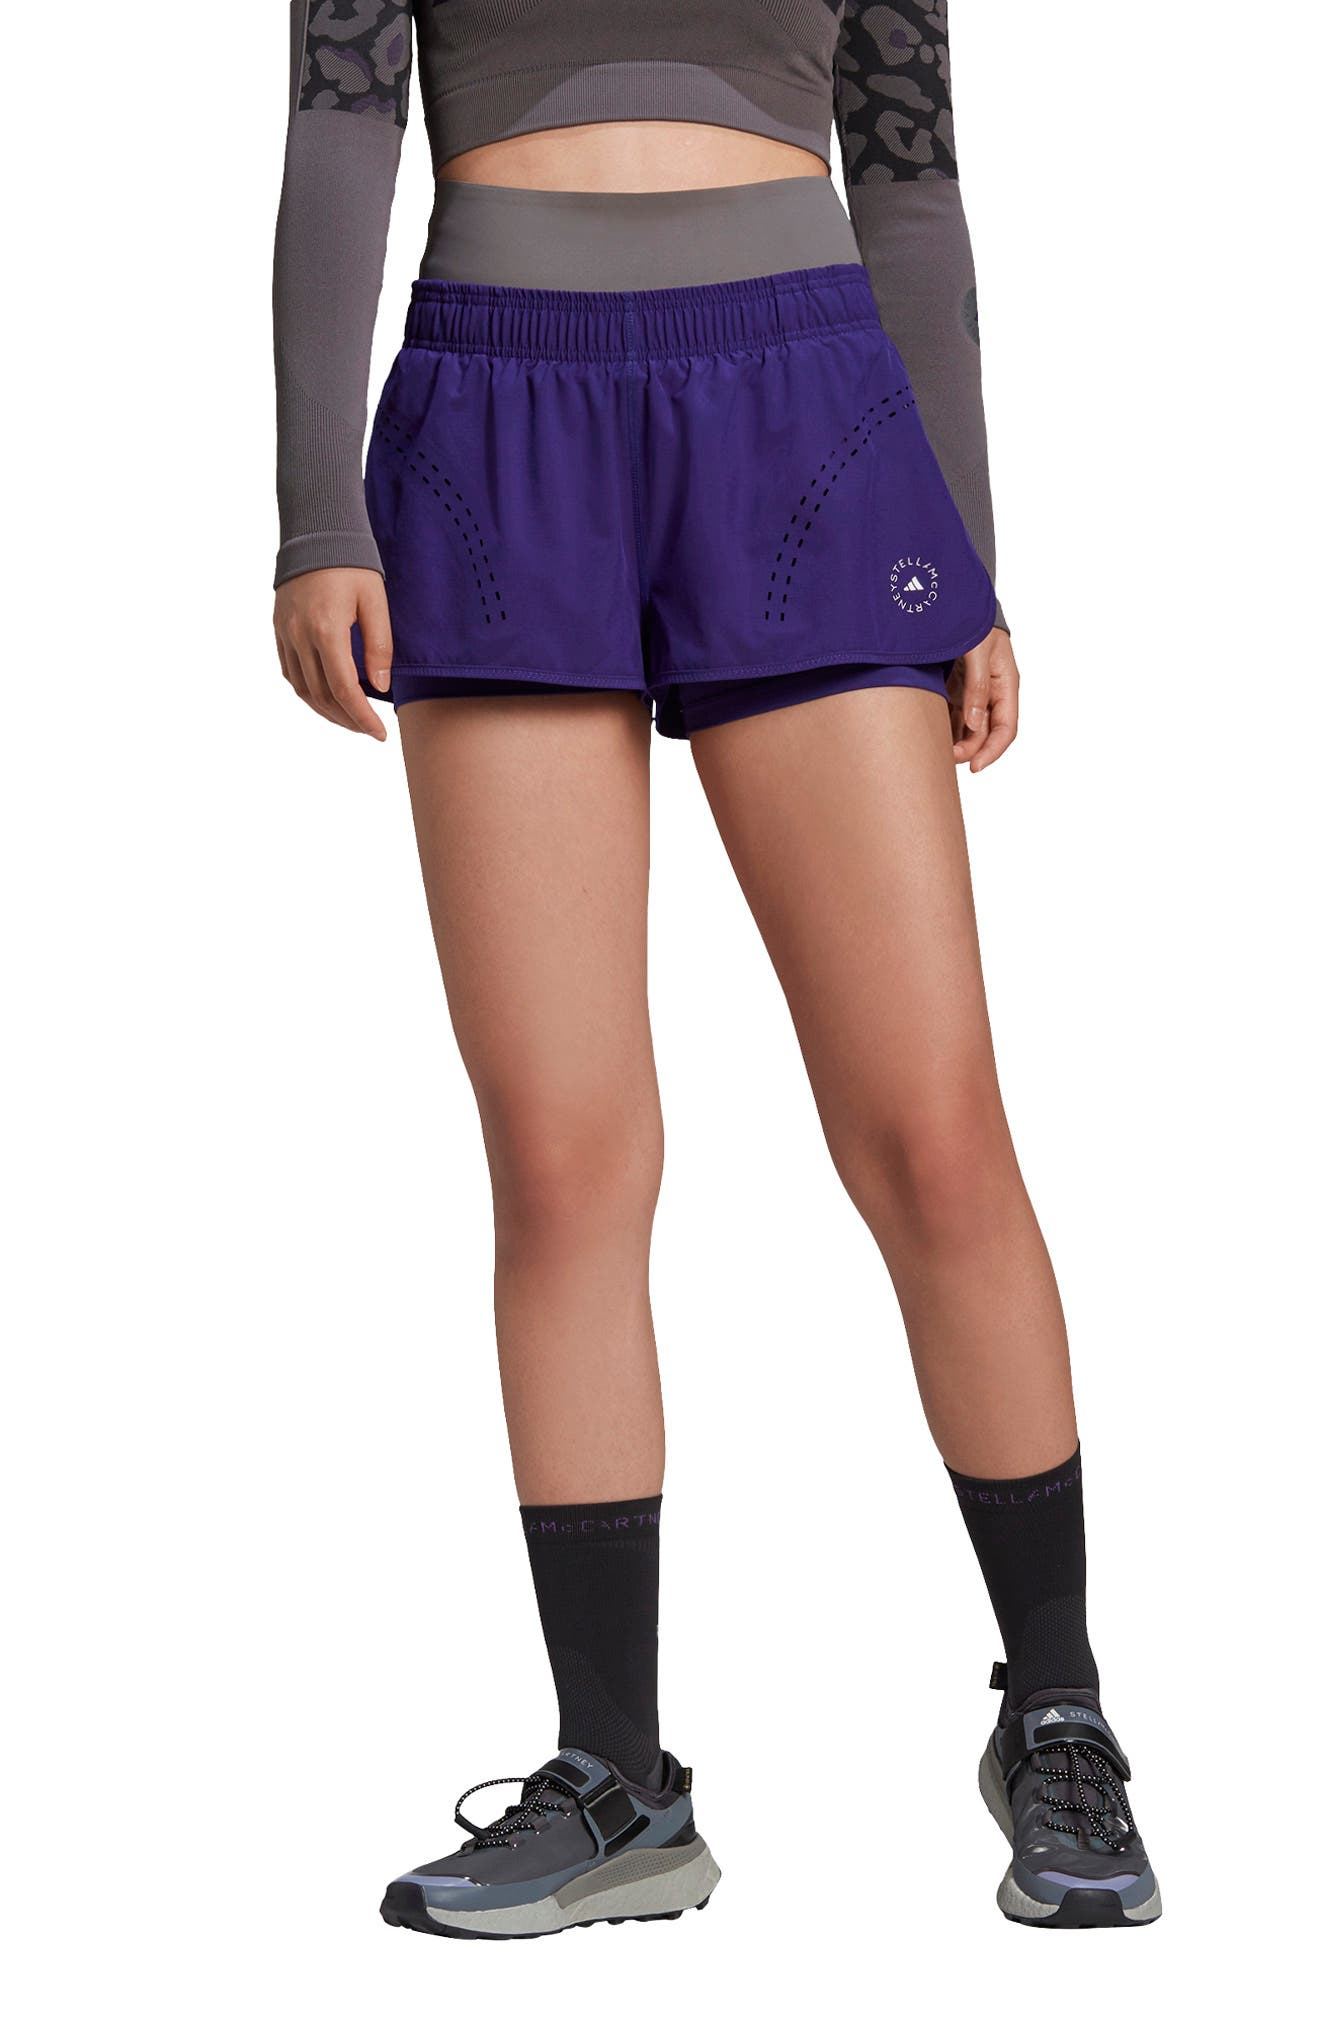 Adidas by Stella McCartney TruePurpose Layered Performance Shorts | Nordstrom